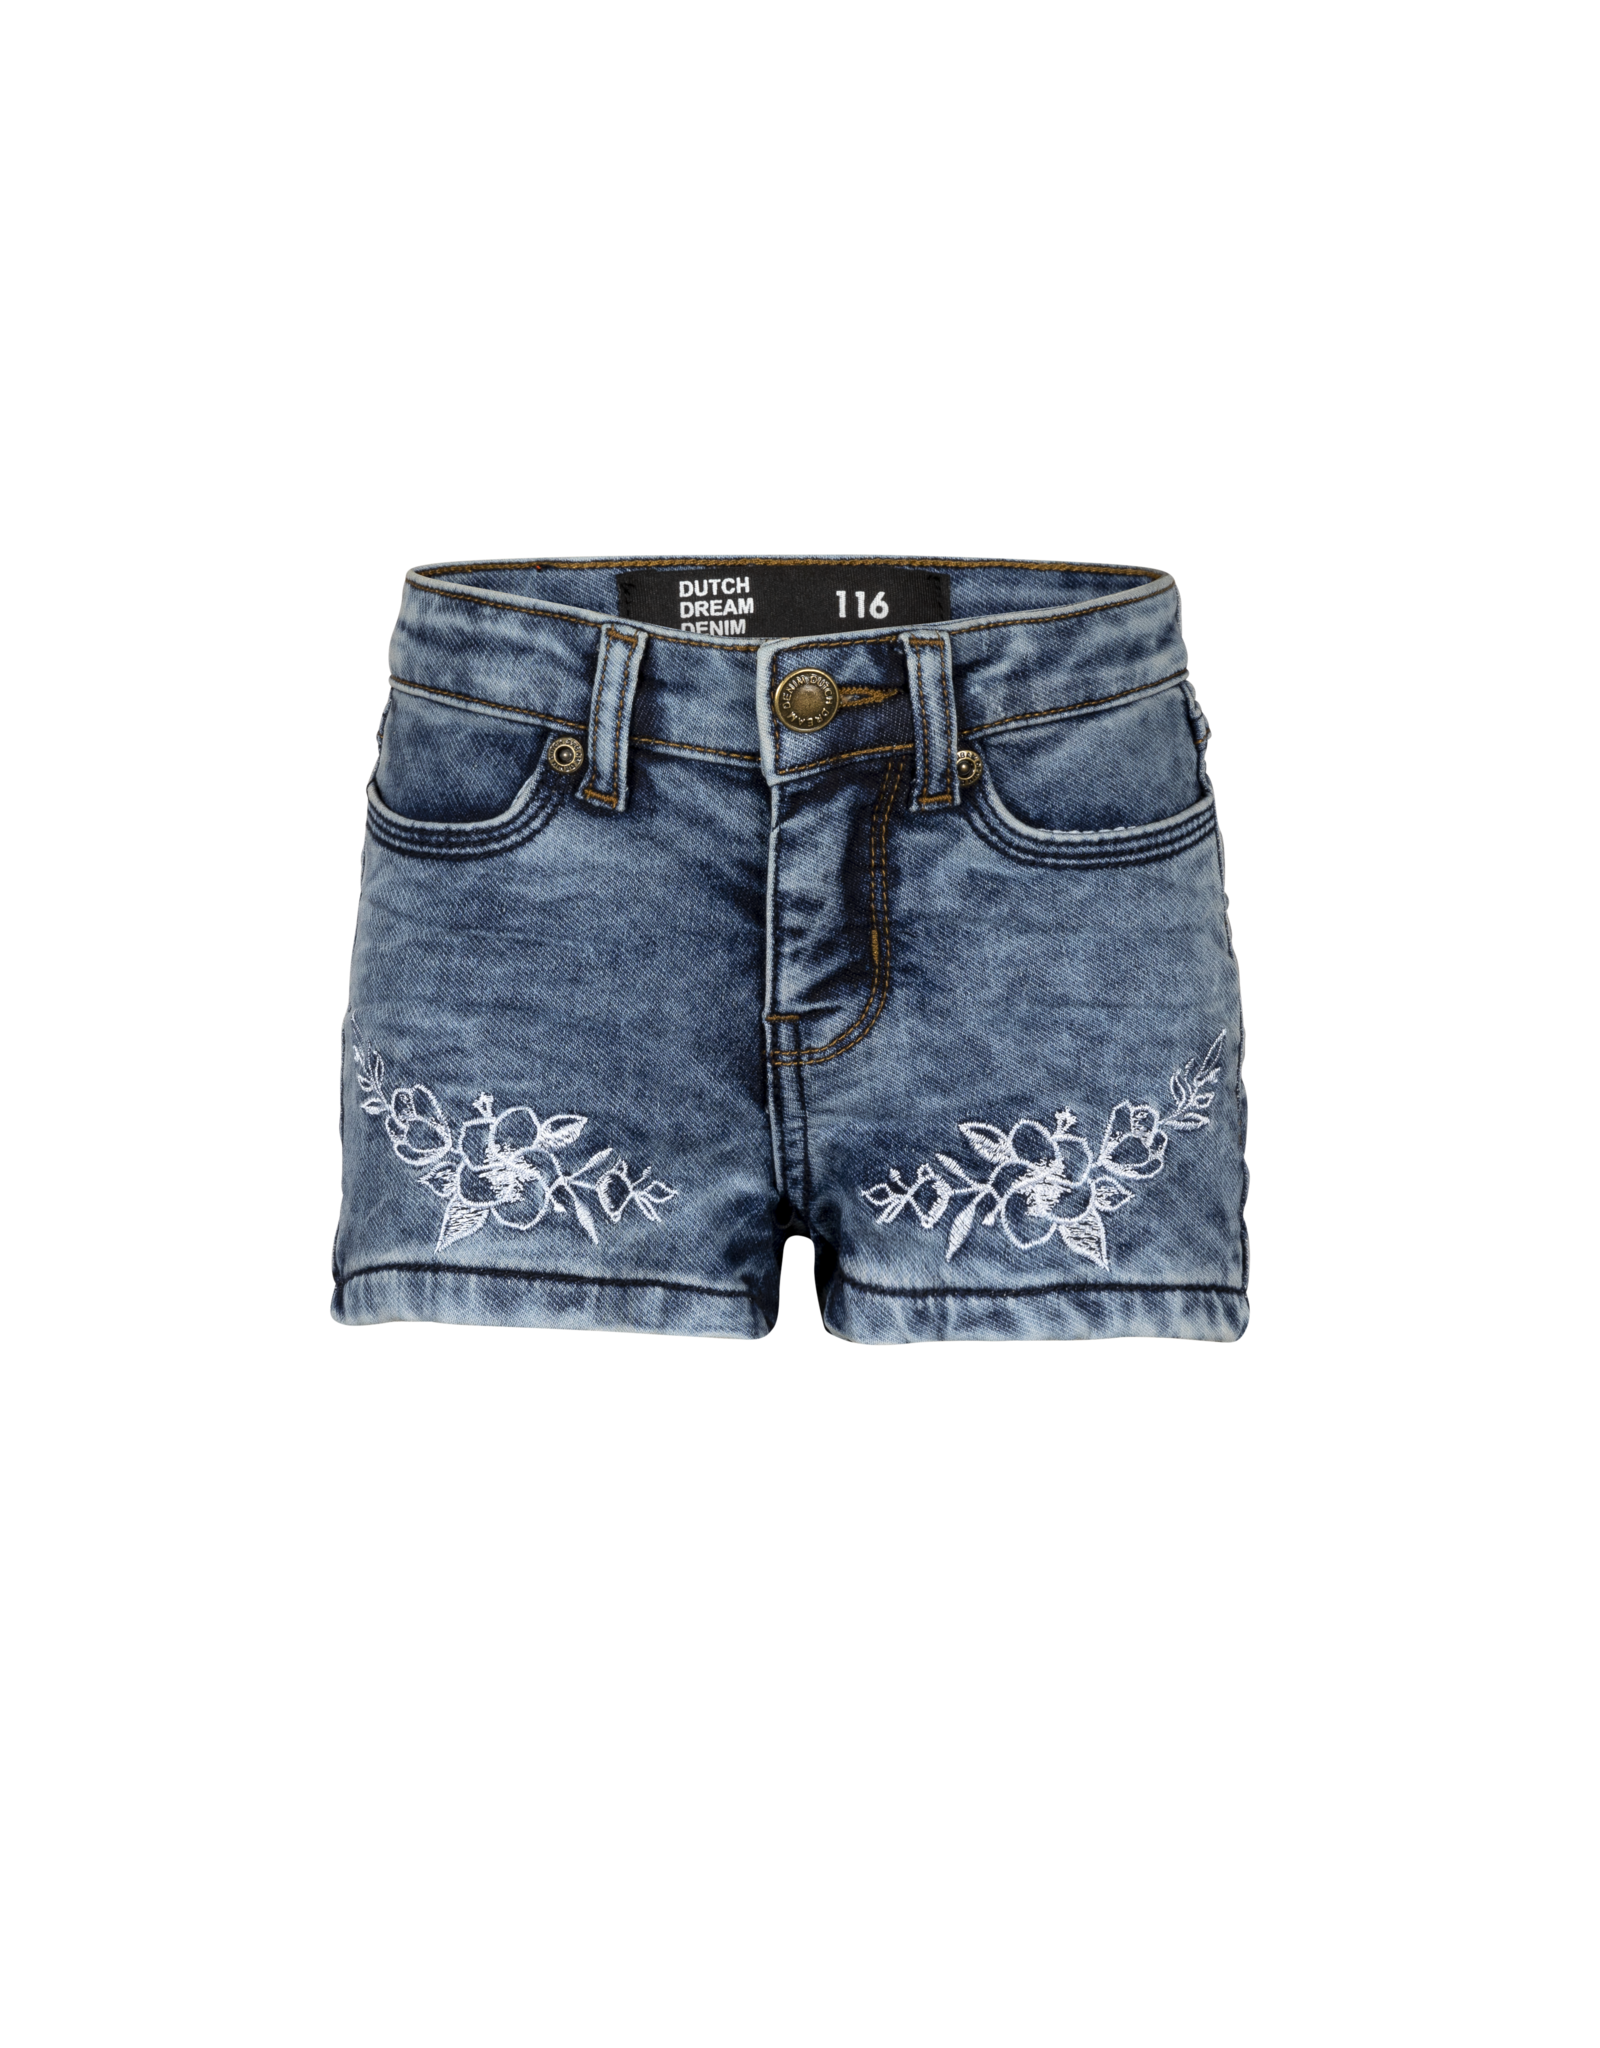 Dutch dream denim NJIA, Jogg jeans shorts met met borduursel